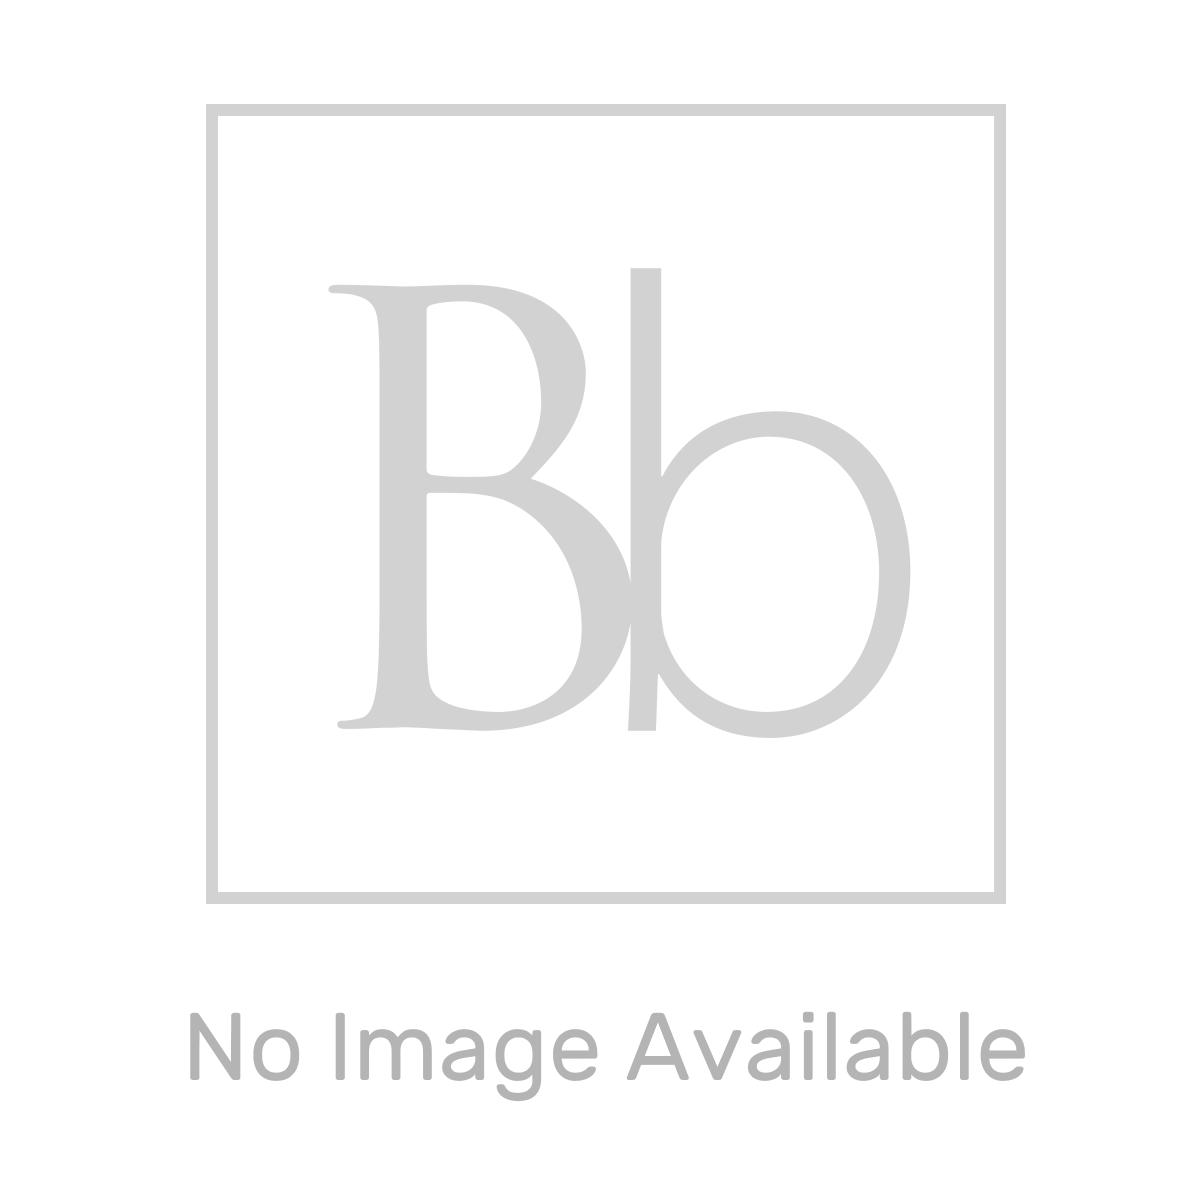 Nuie Eden High Gloss White Floor Standing Cabinet & Basin 1 500mm Line Drawing